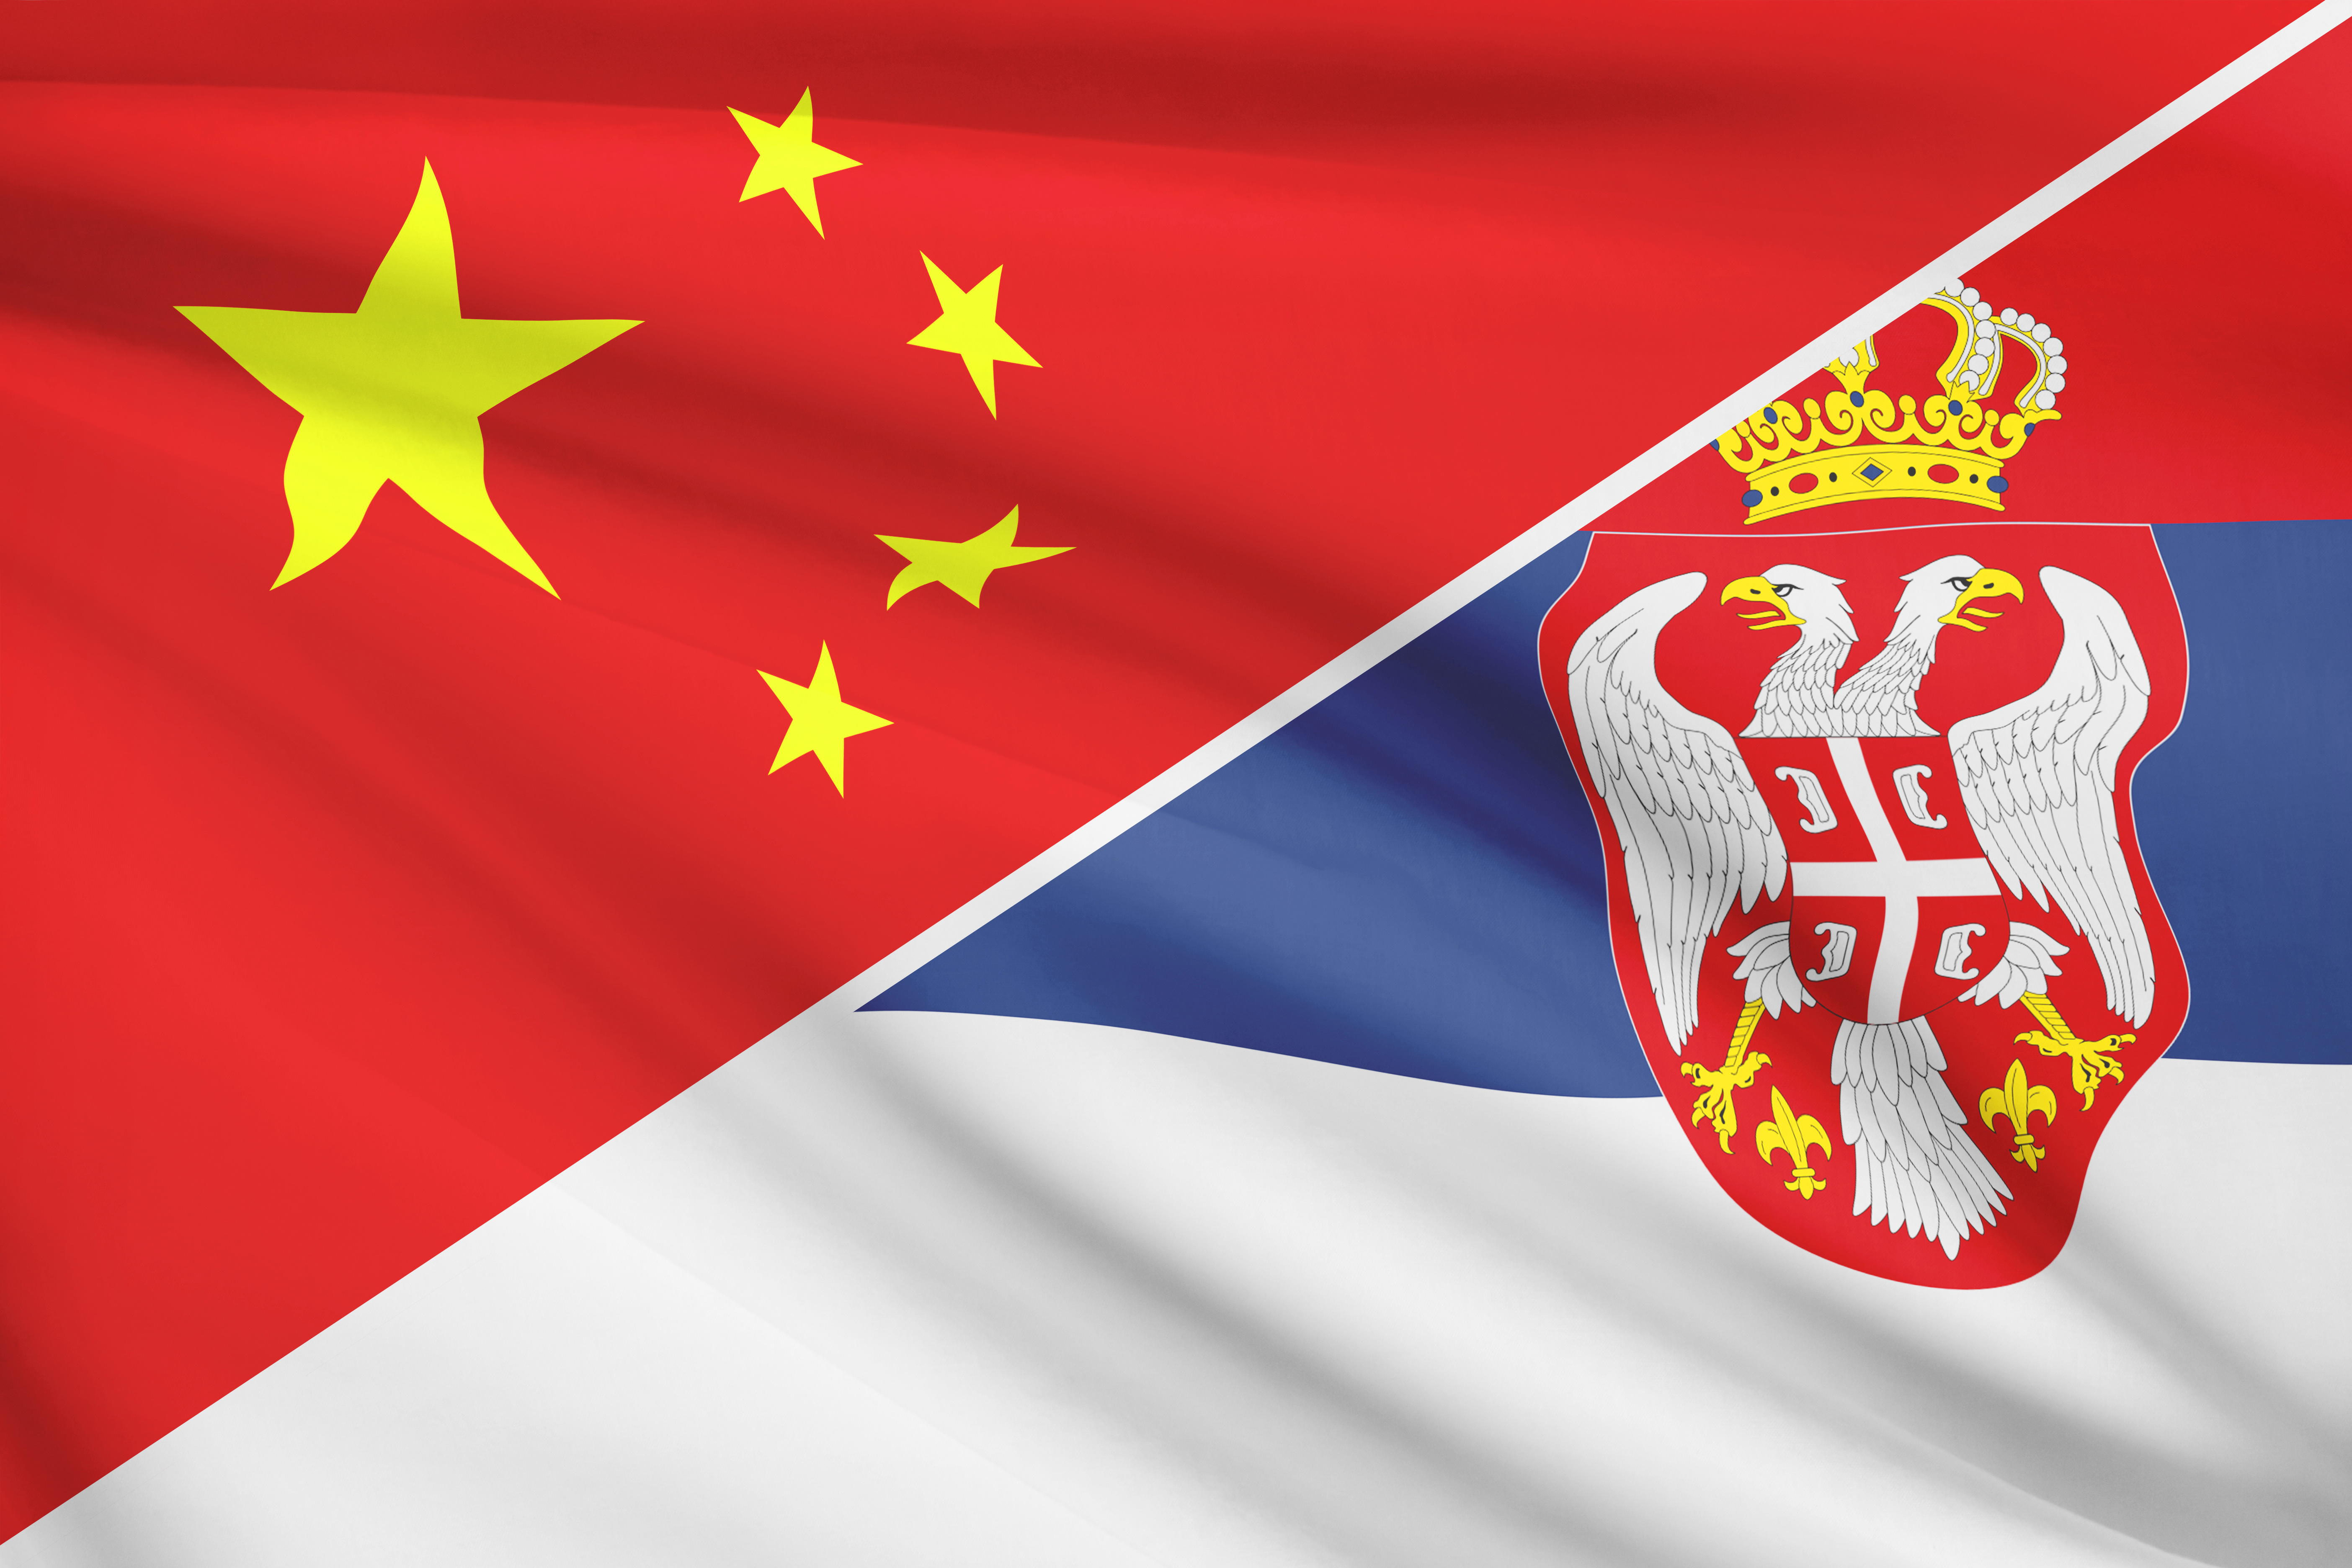 Serbia's increasing importance for China's BRI